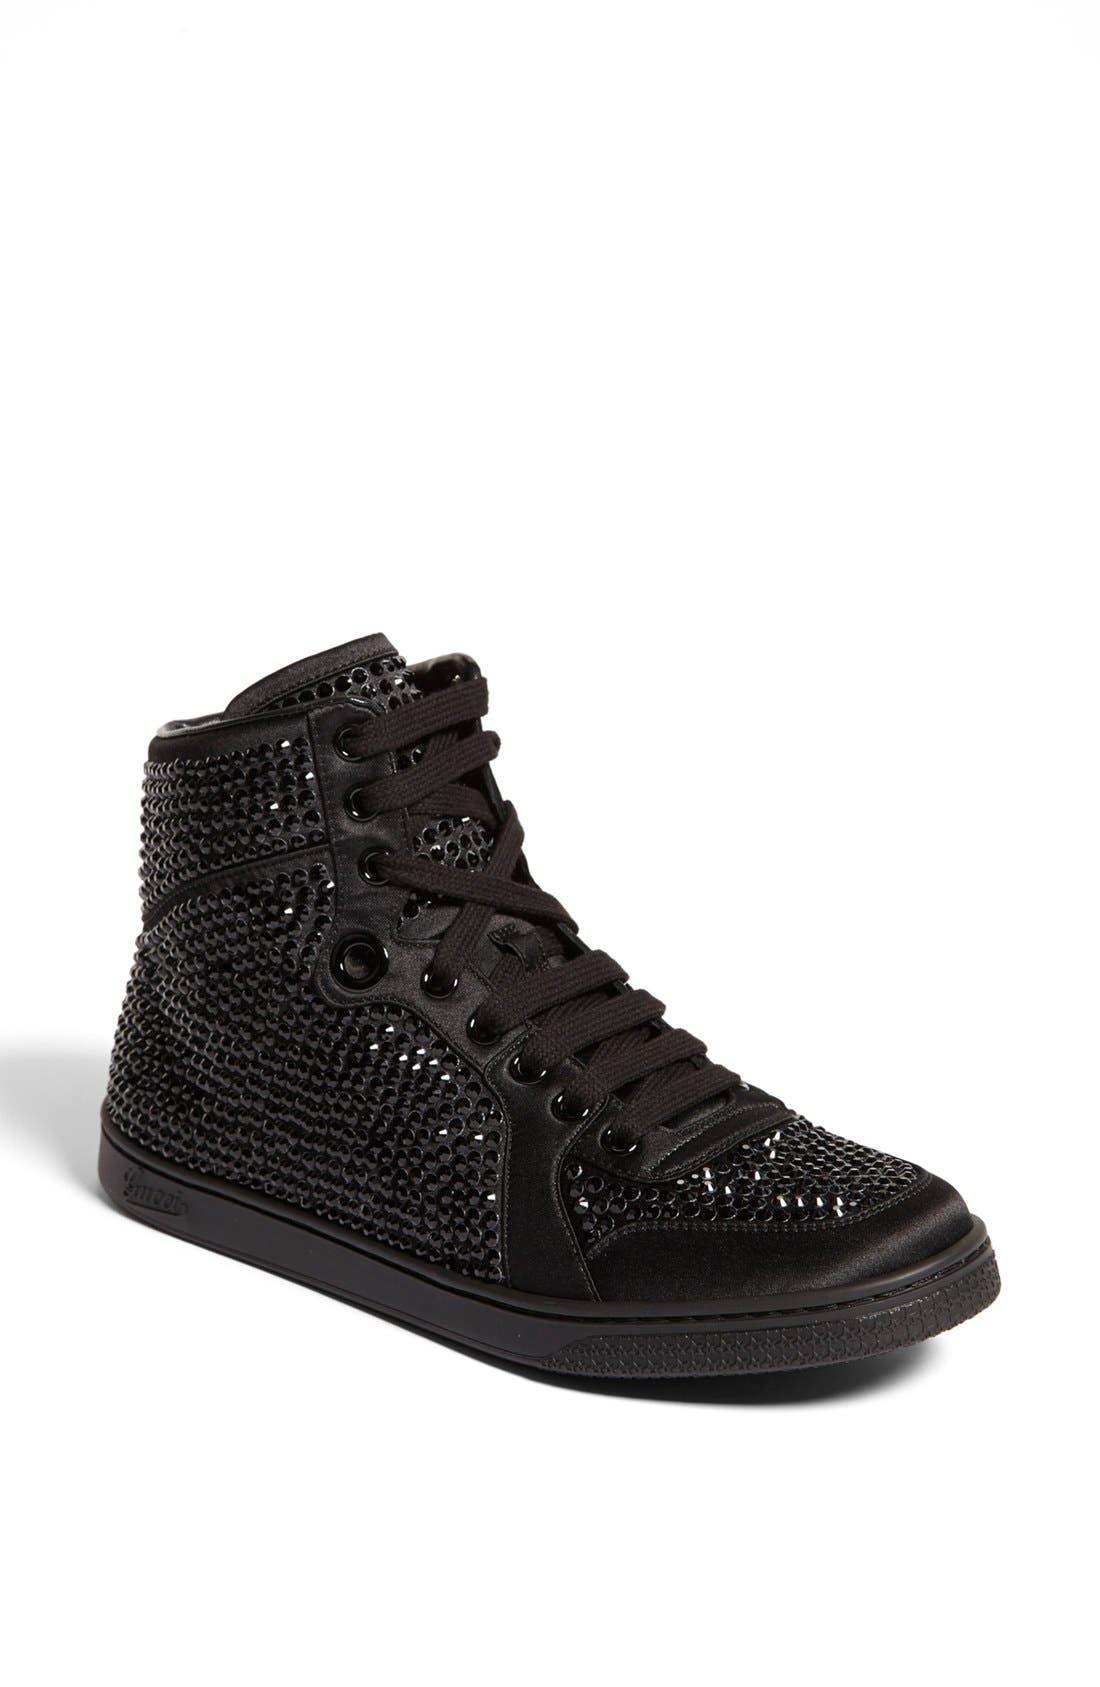 Main Image - Gucci 'Coda' Crystal Stud High Top Sneaker